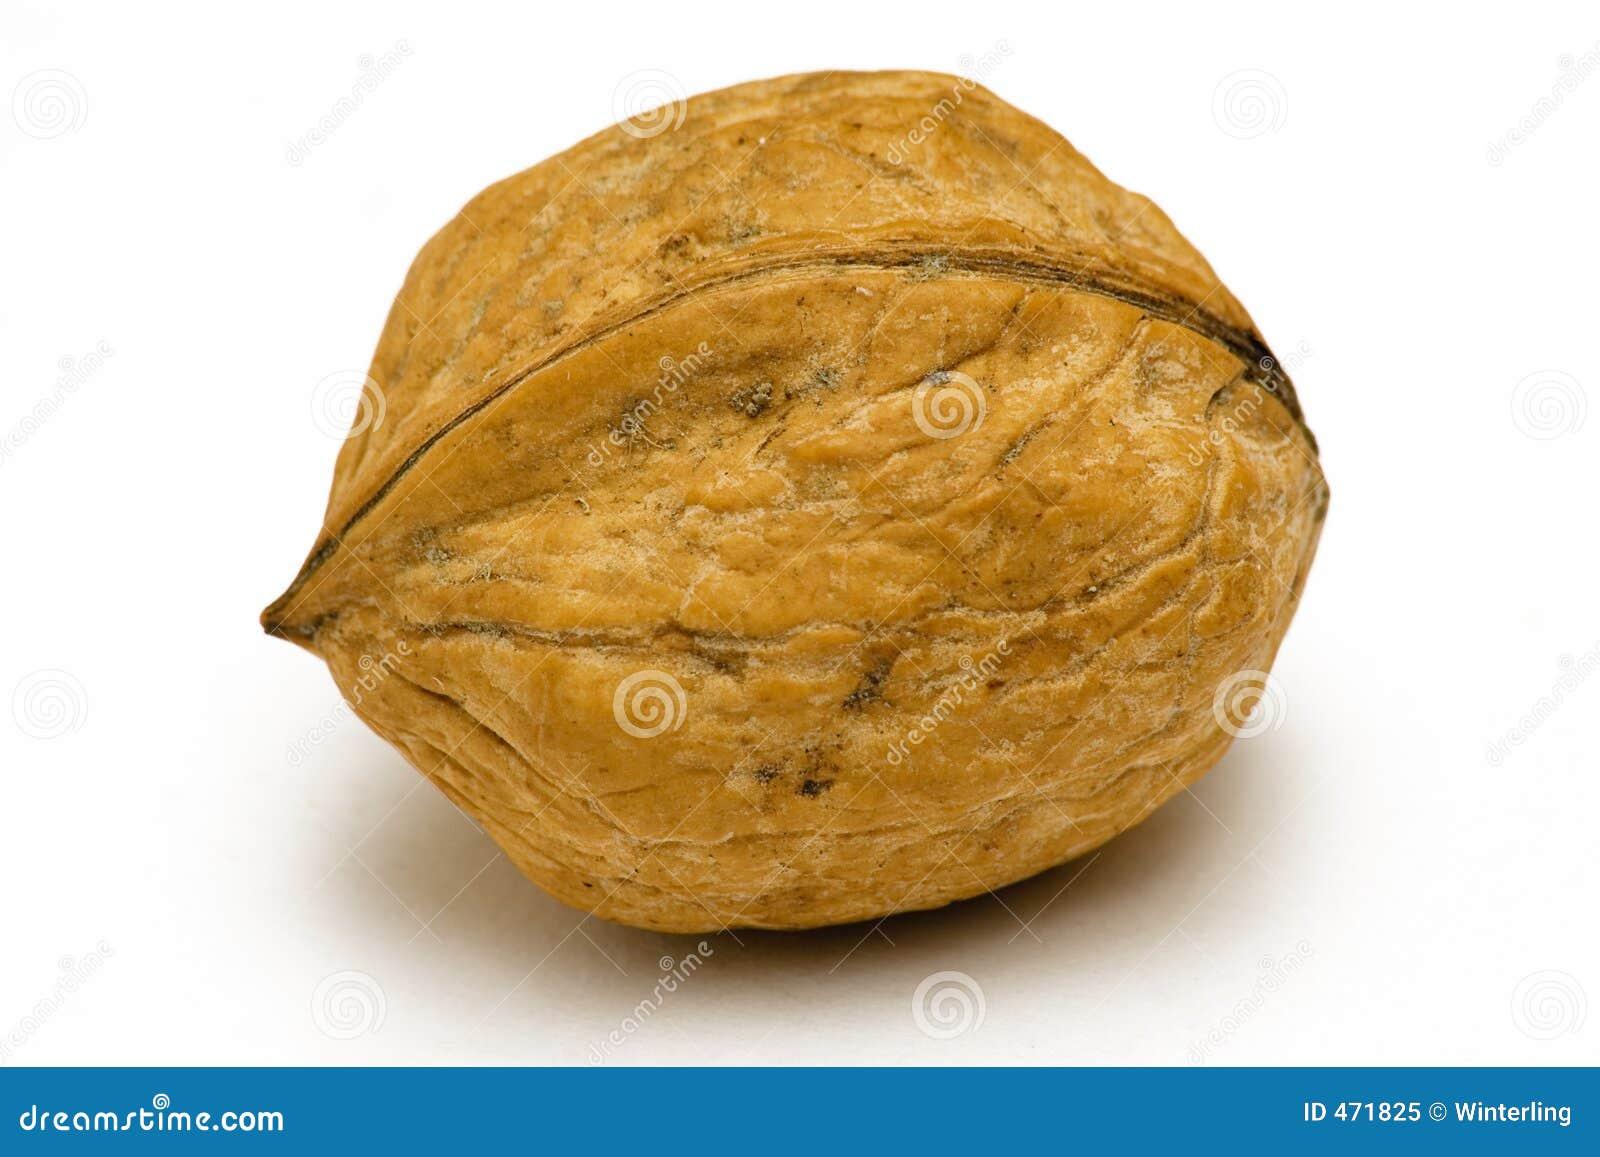 Download Single Walnut stock image. Image of close, nature, nutshell - 471825